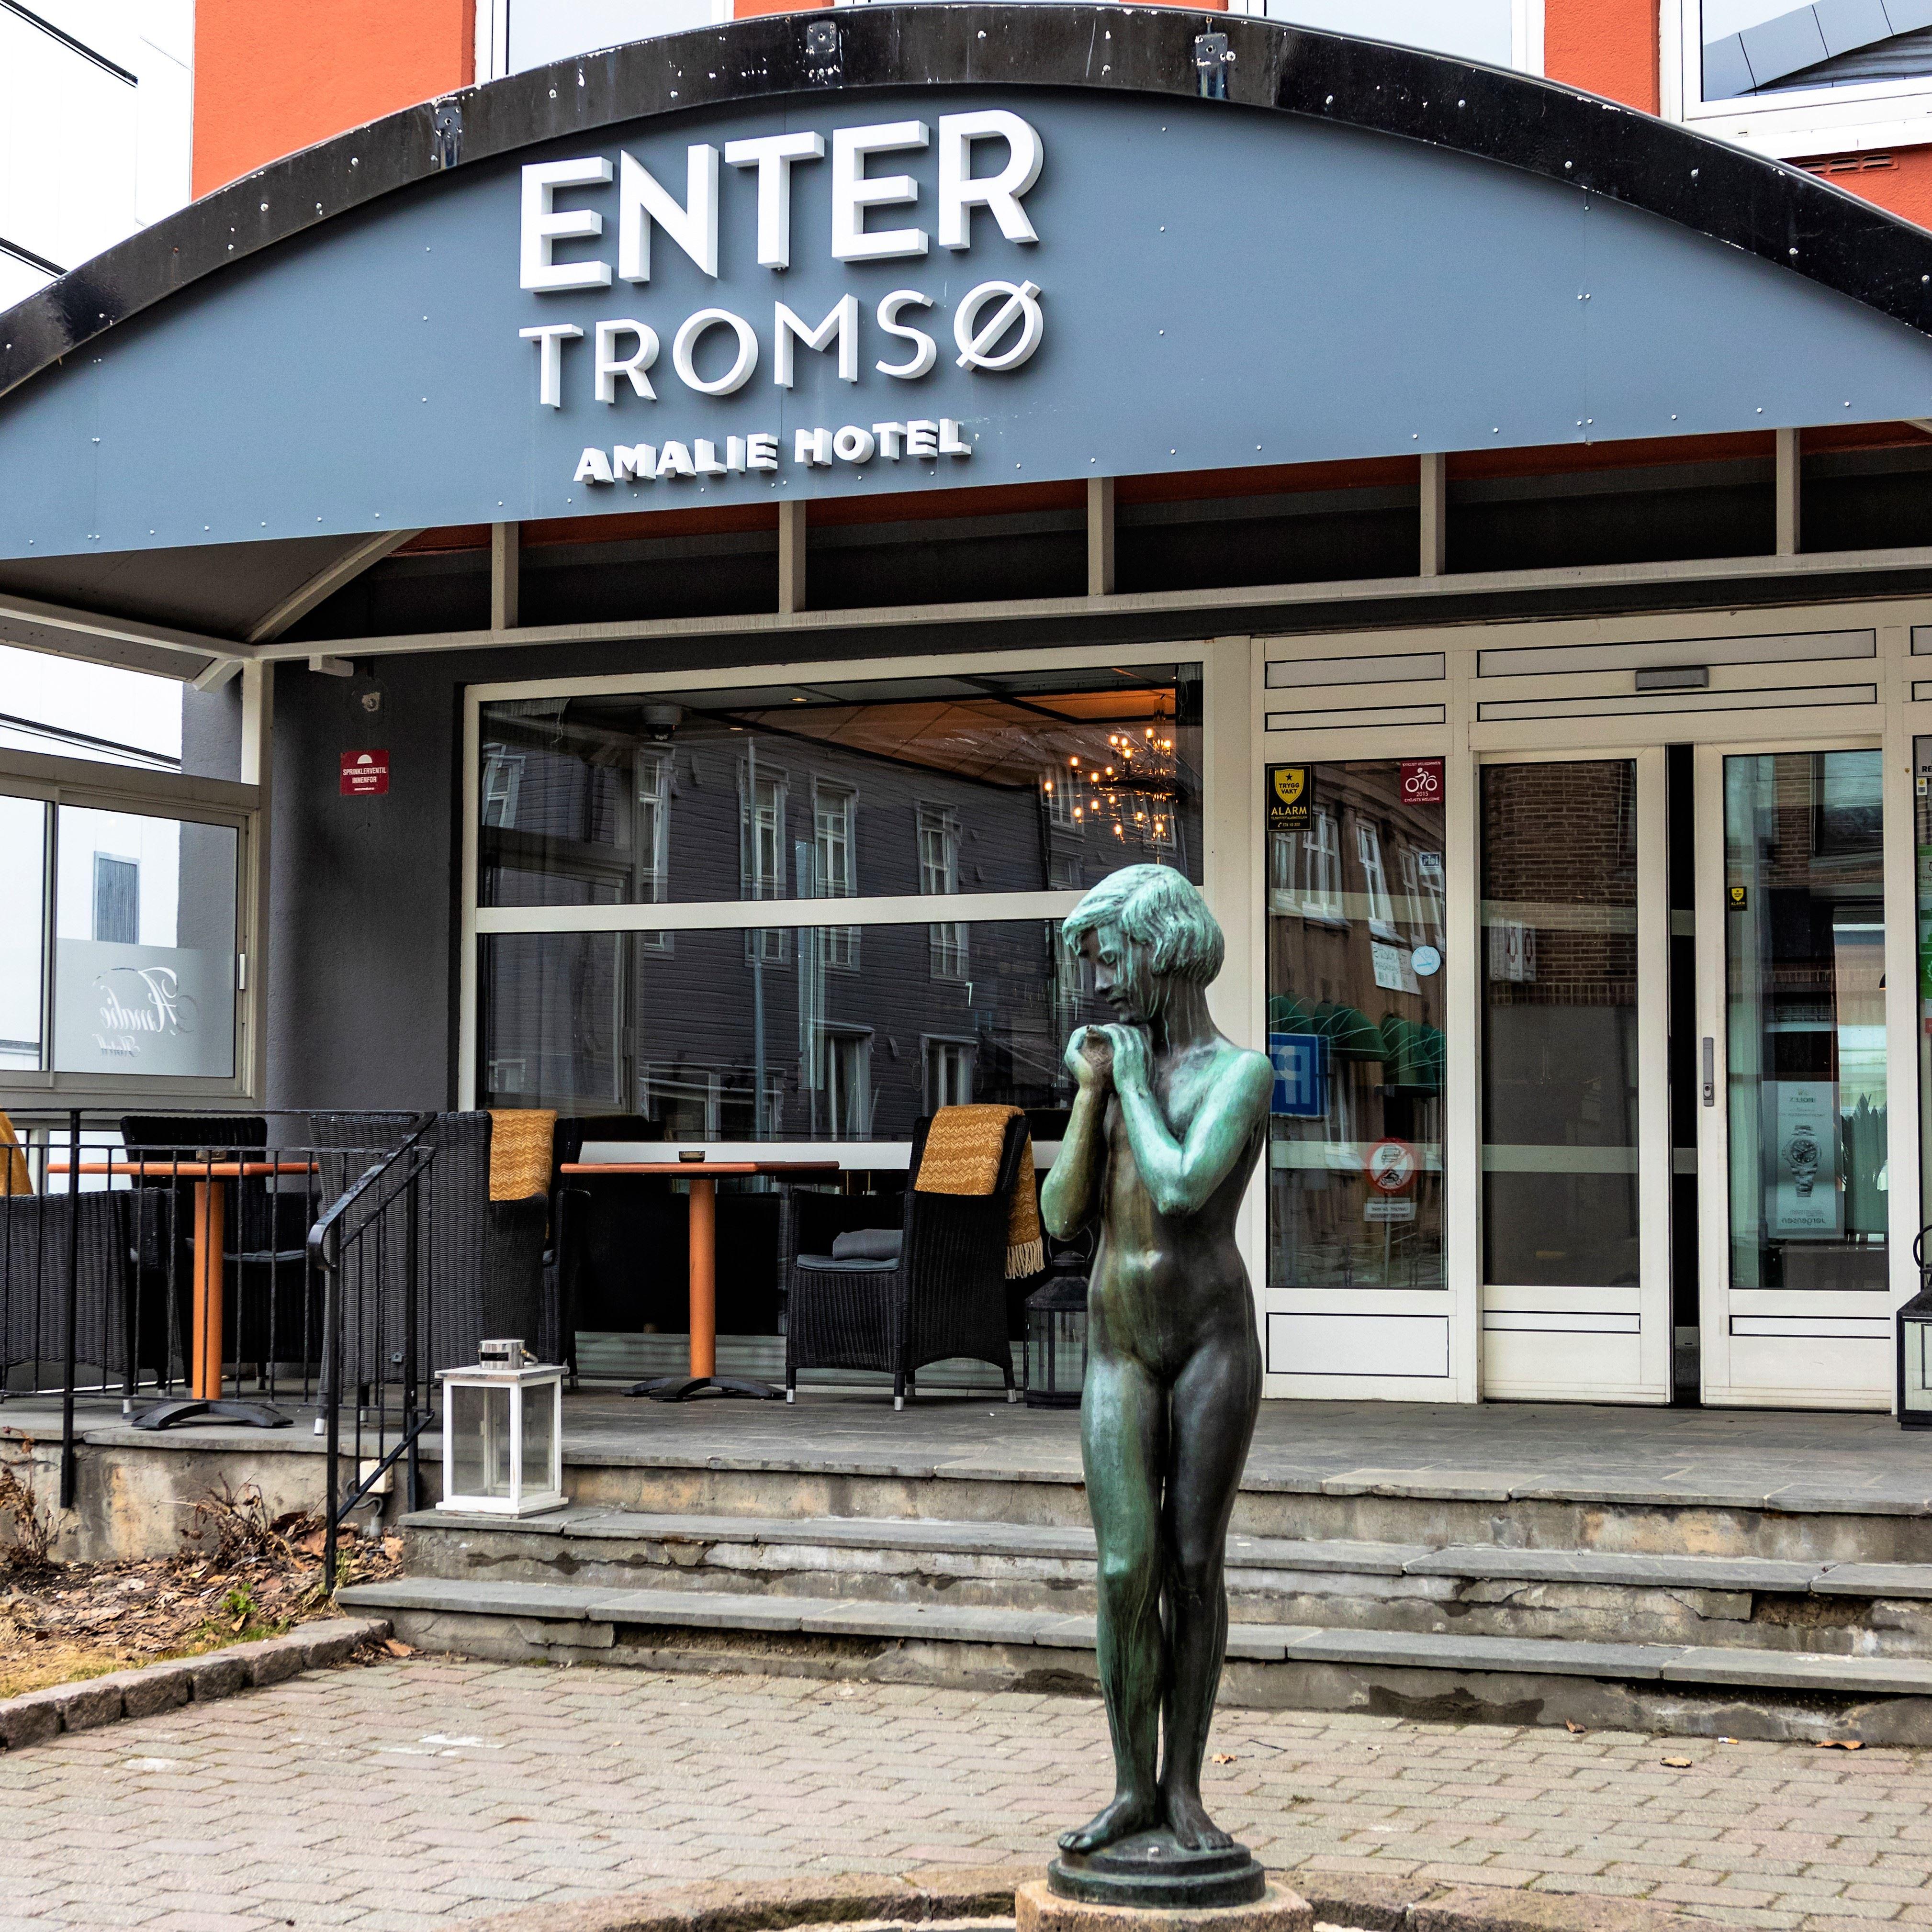 Enter Tromsø Amalie Hotel